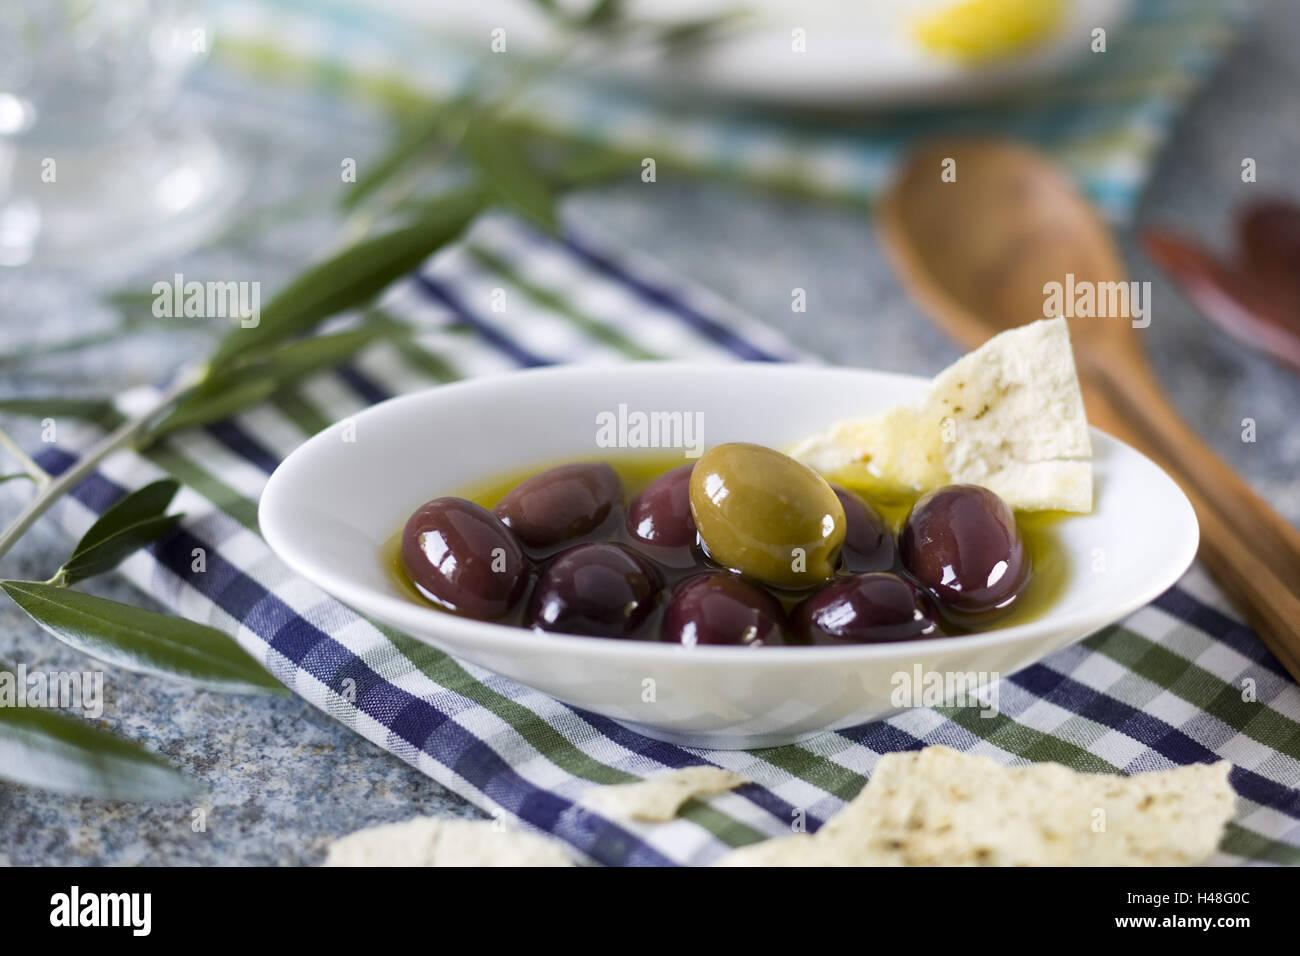 Olive dished plates on blau-grün-weiß-kariertem cloth, - Stock Image